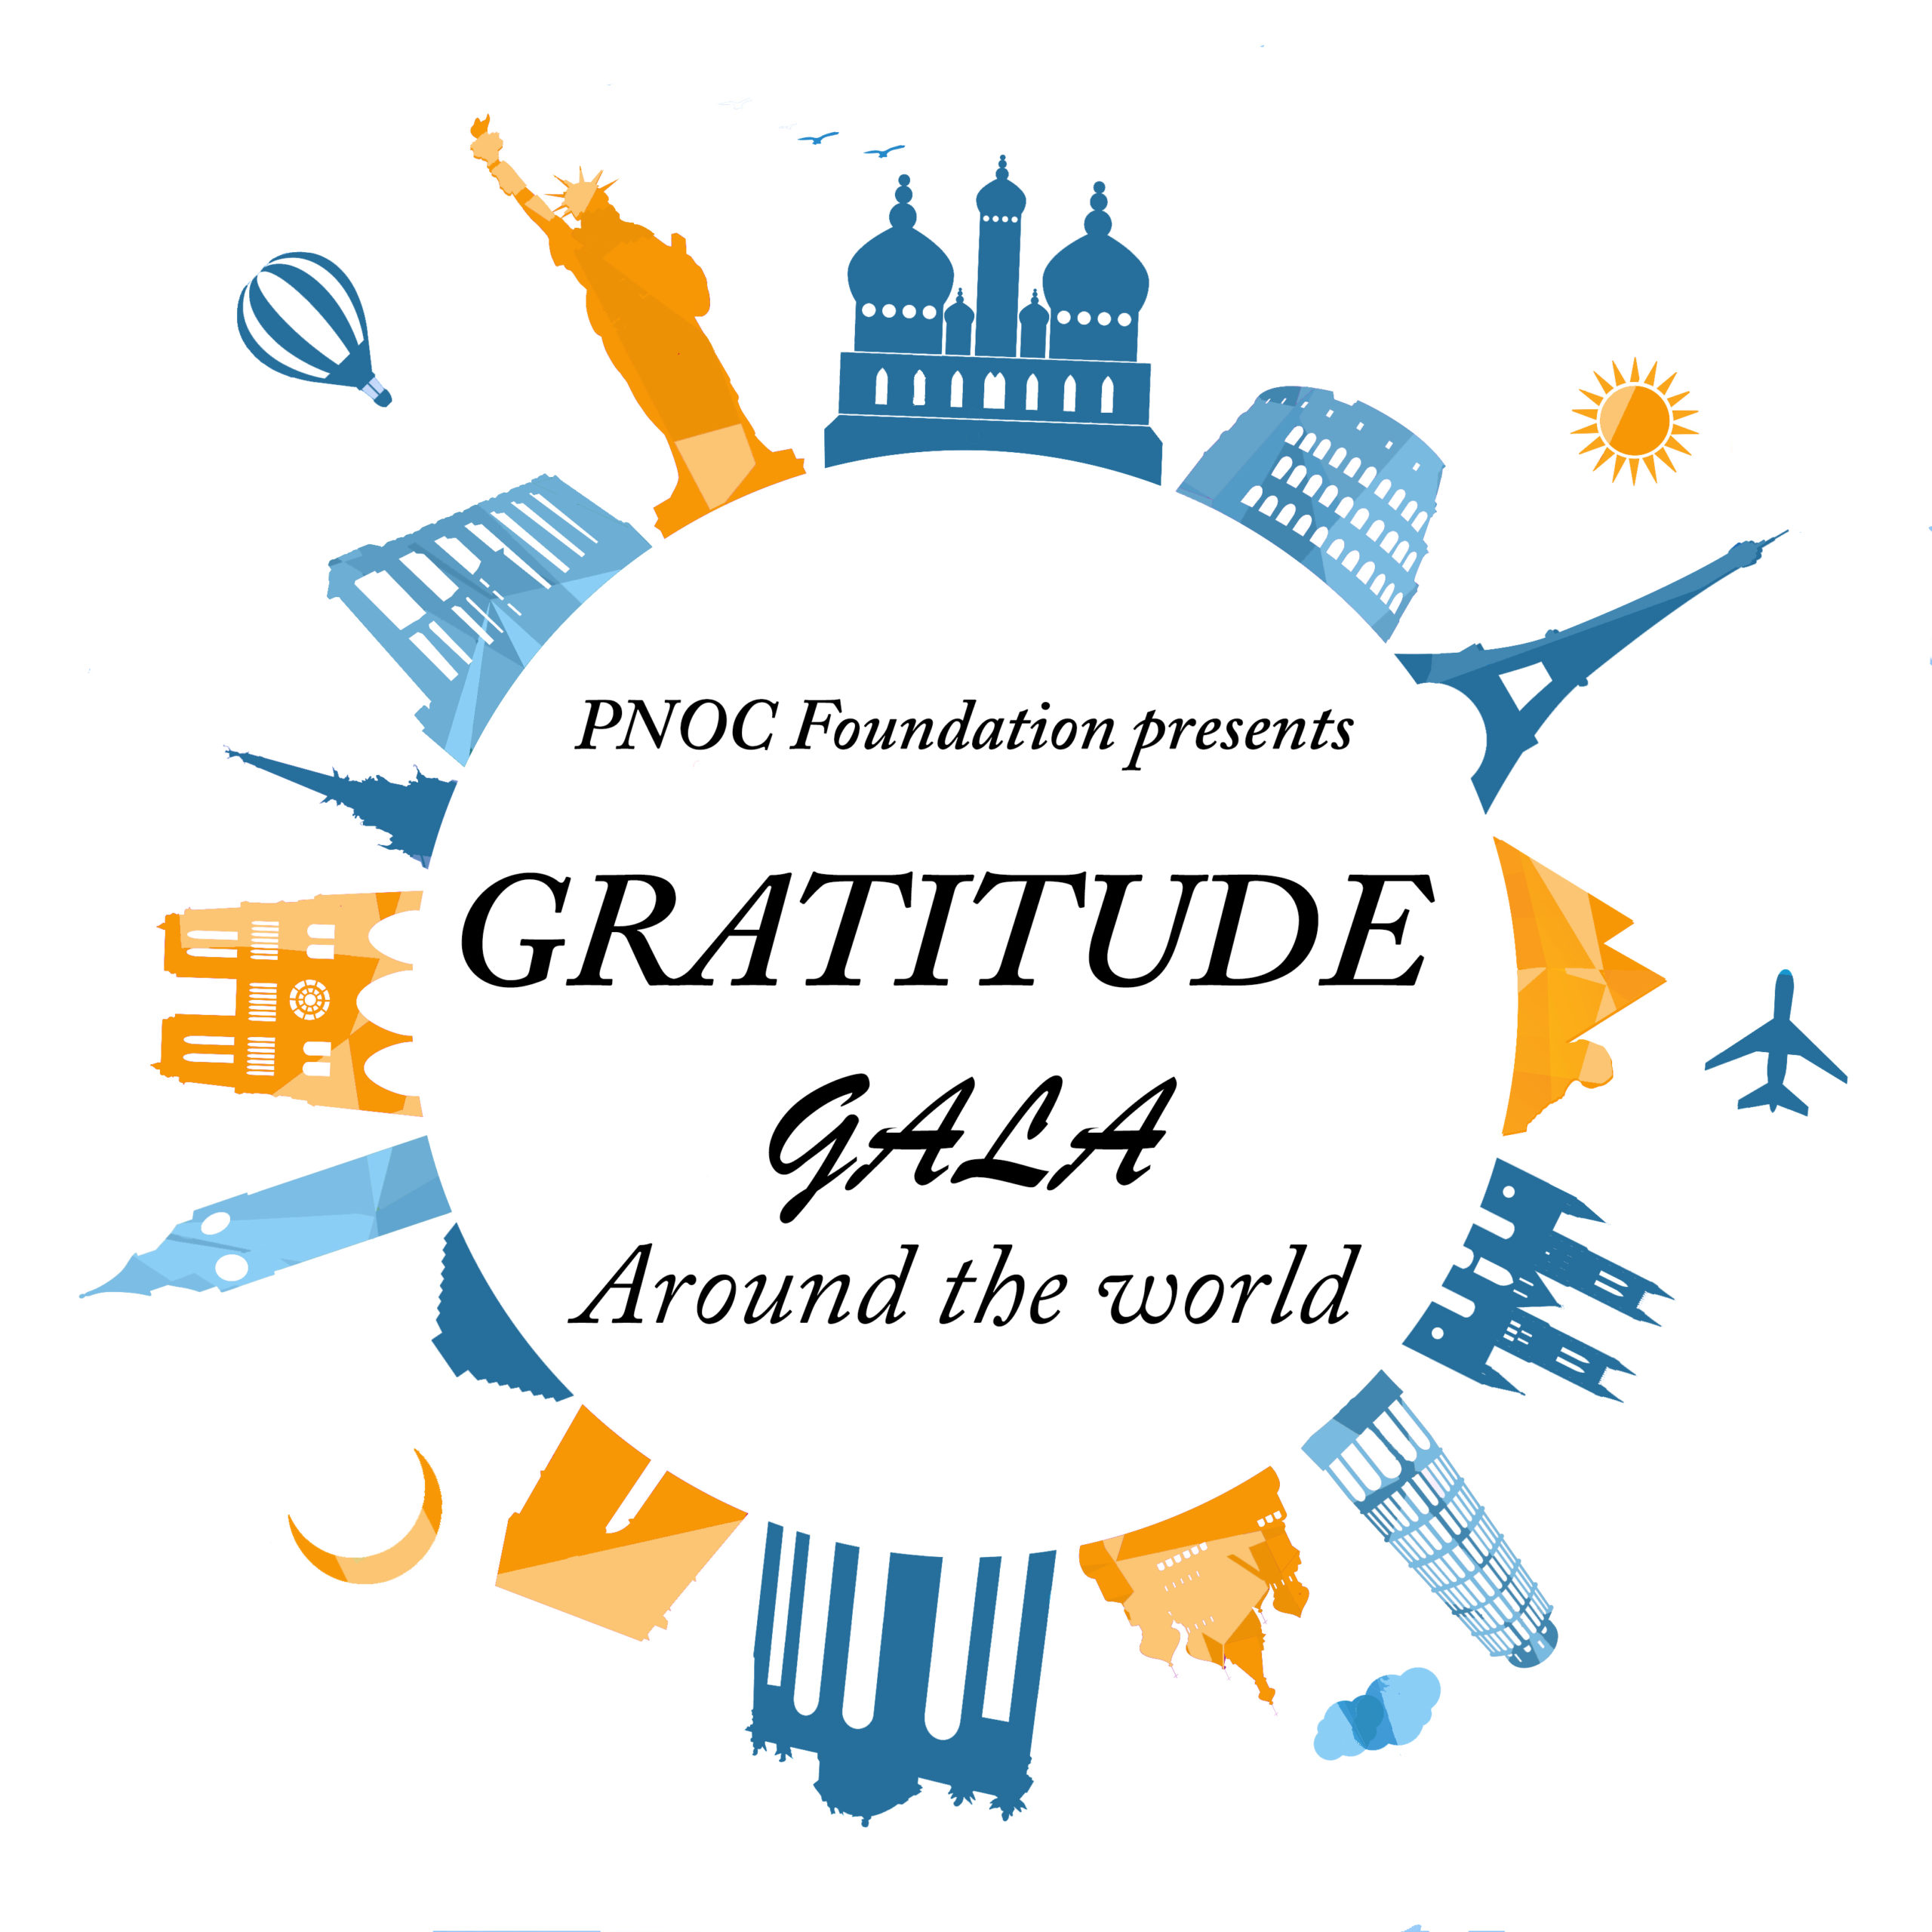 PNOC Foundation presents Gratitude Gala Around The World